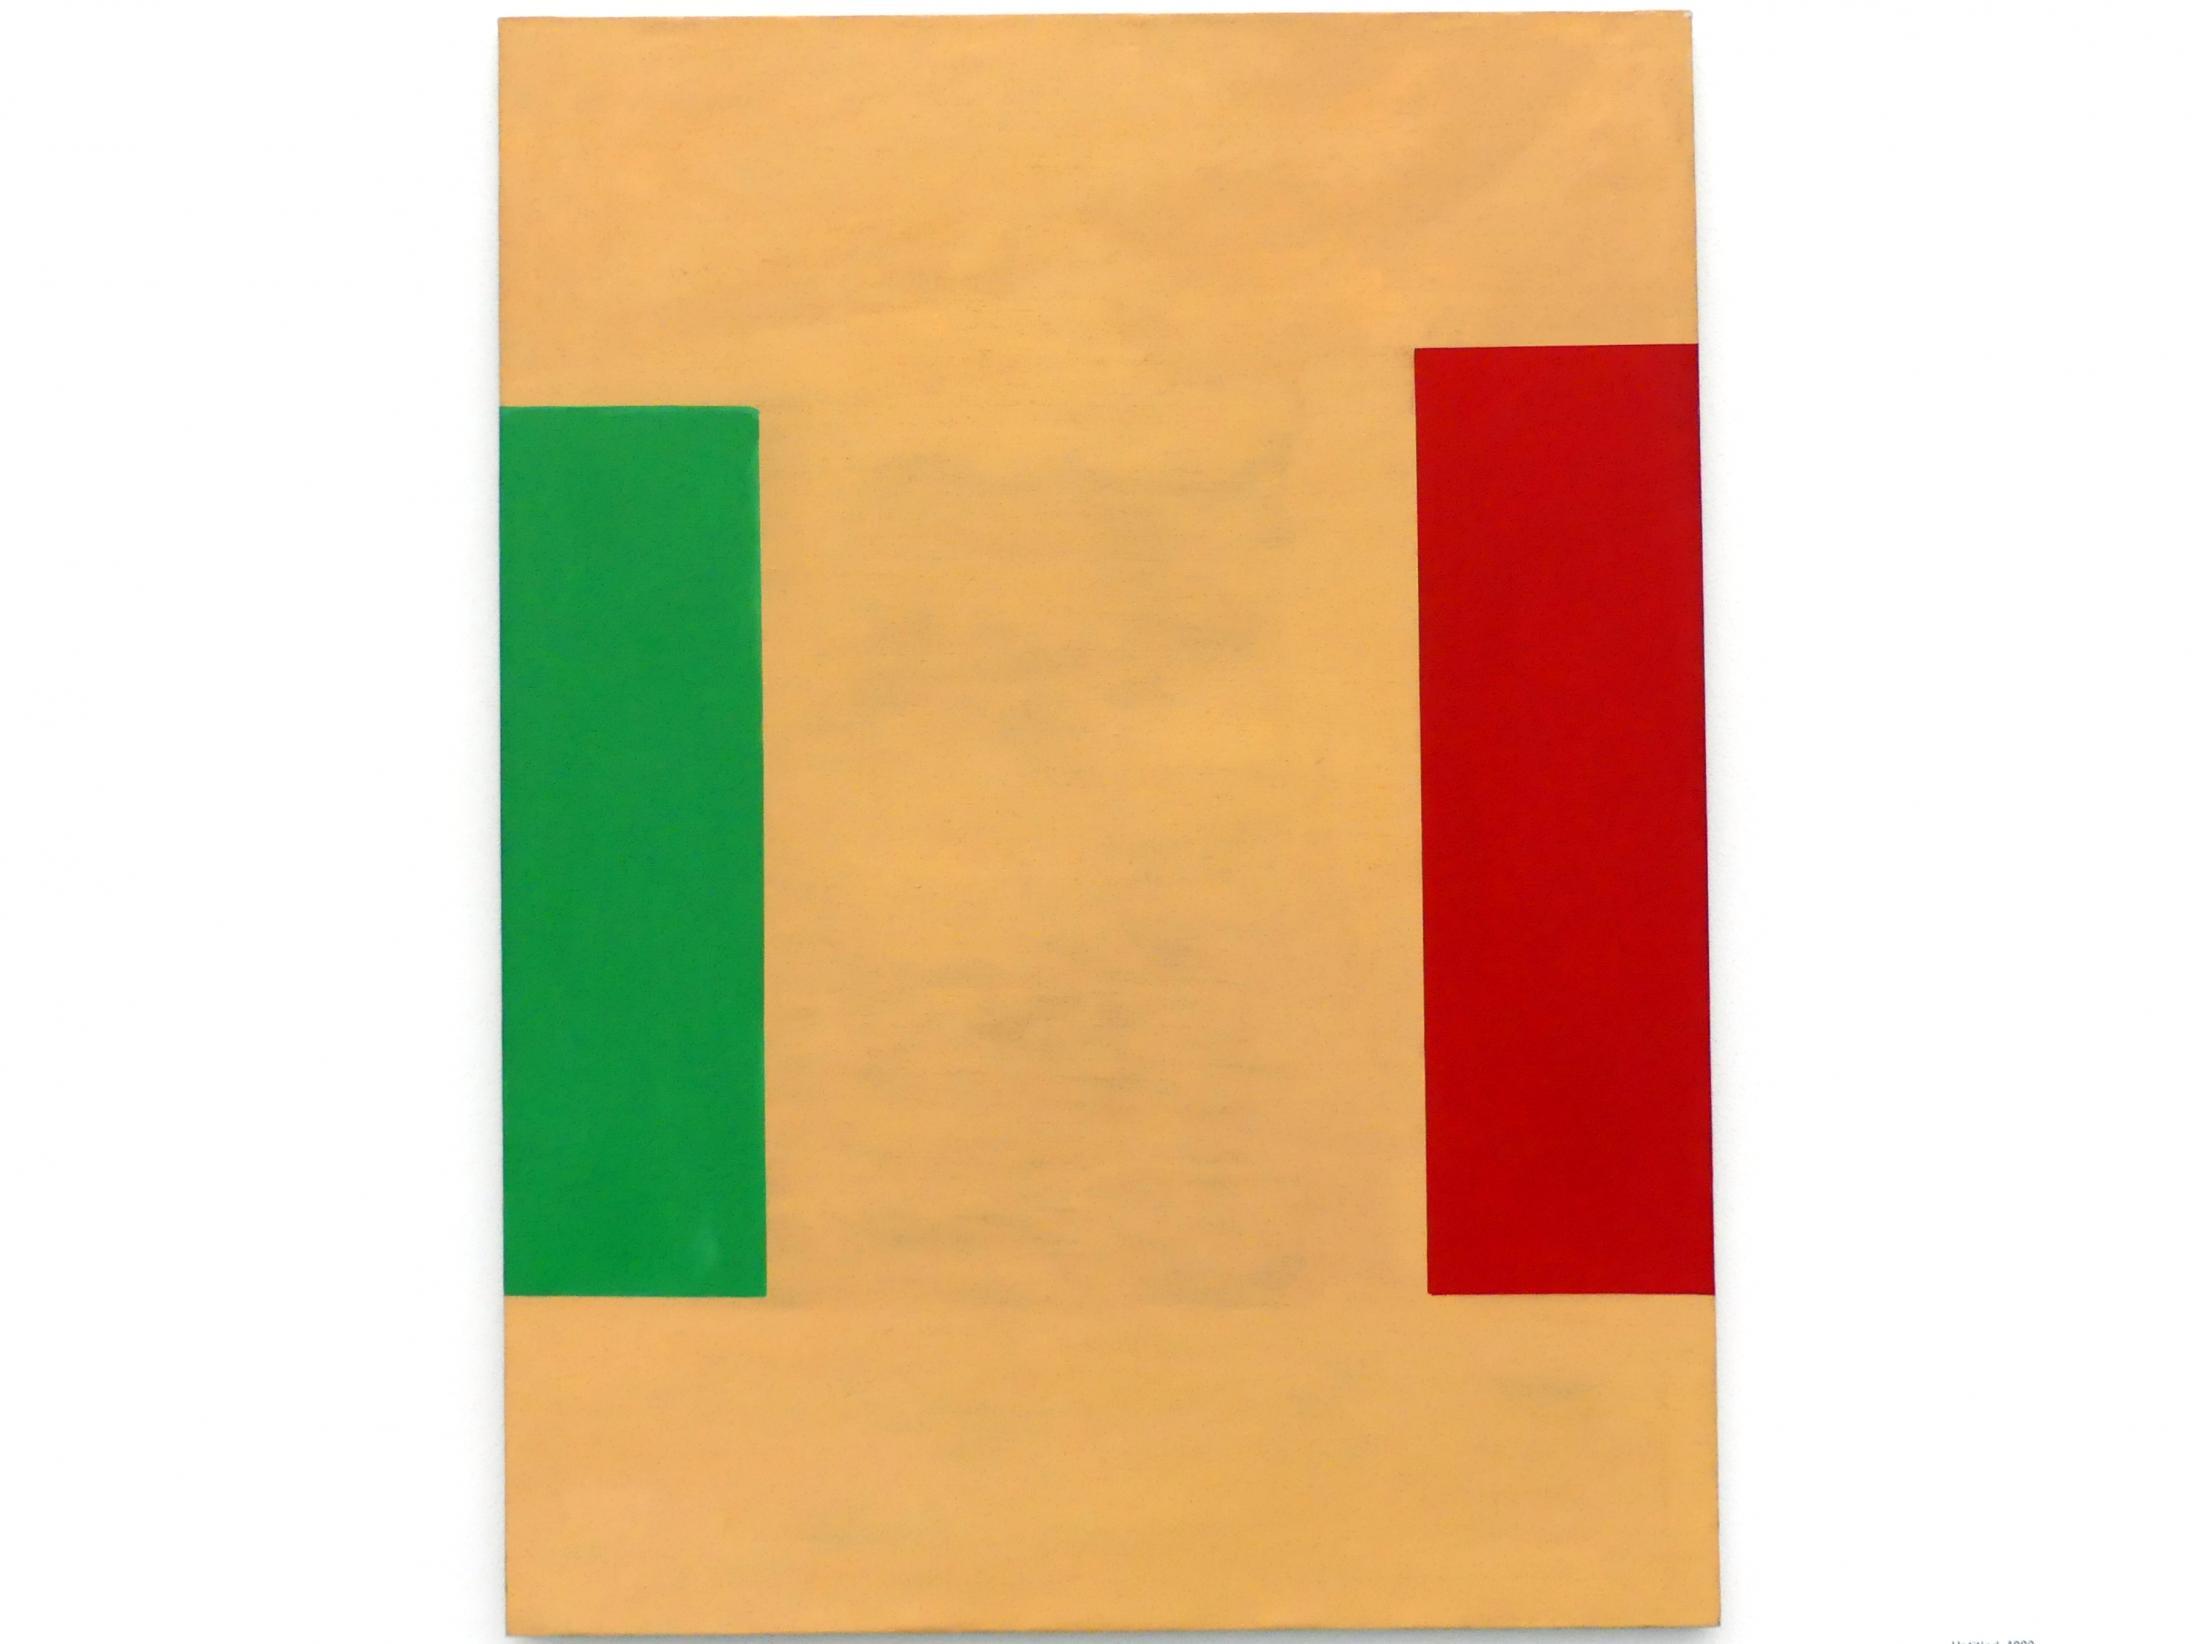 Raoul De Keyser: Untitled, 1990